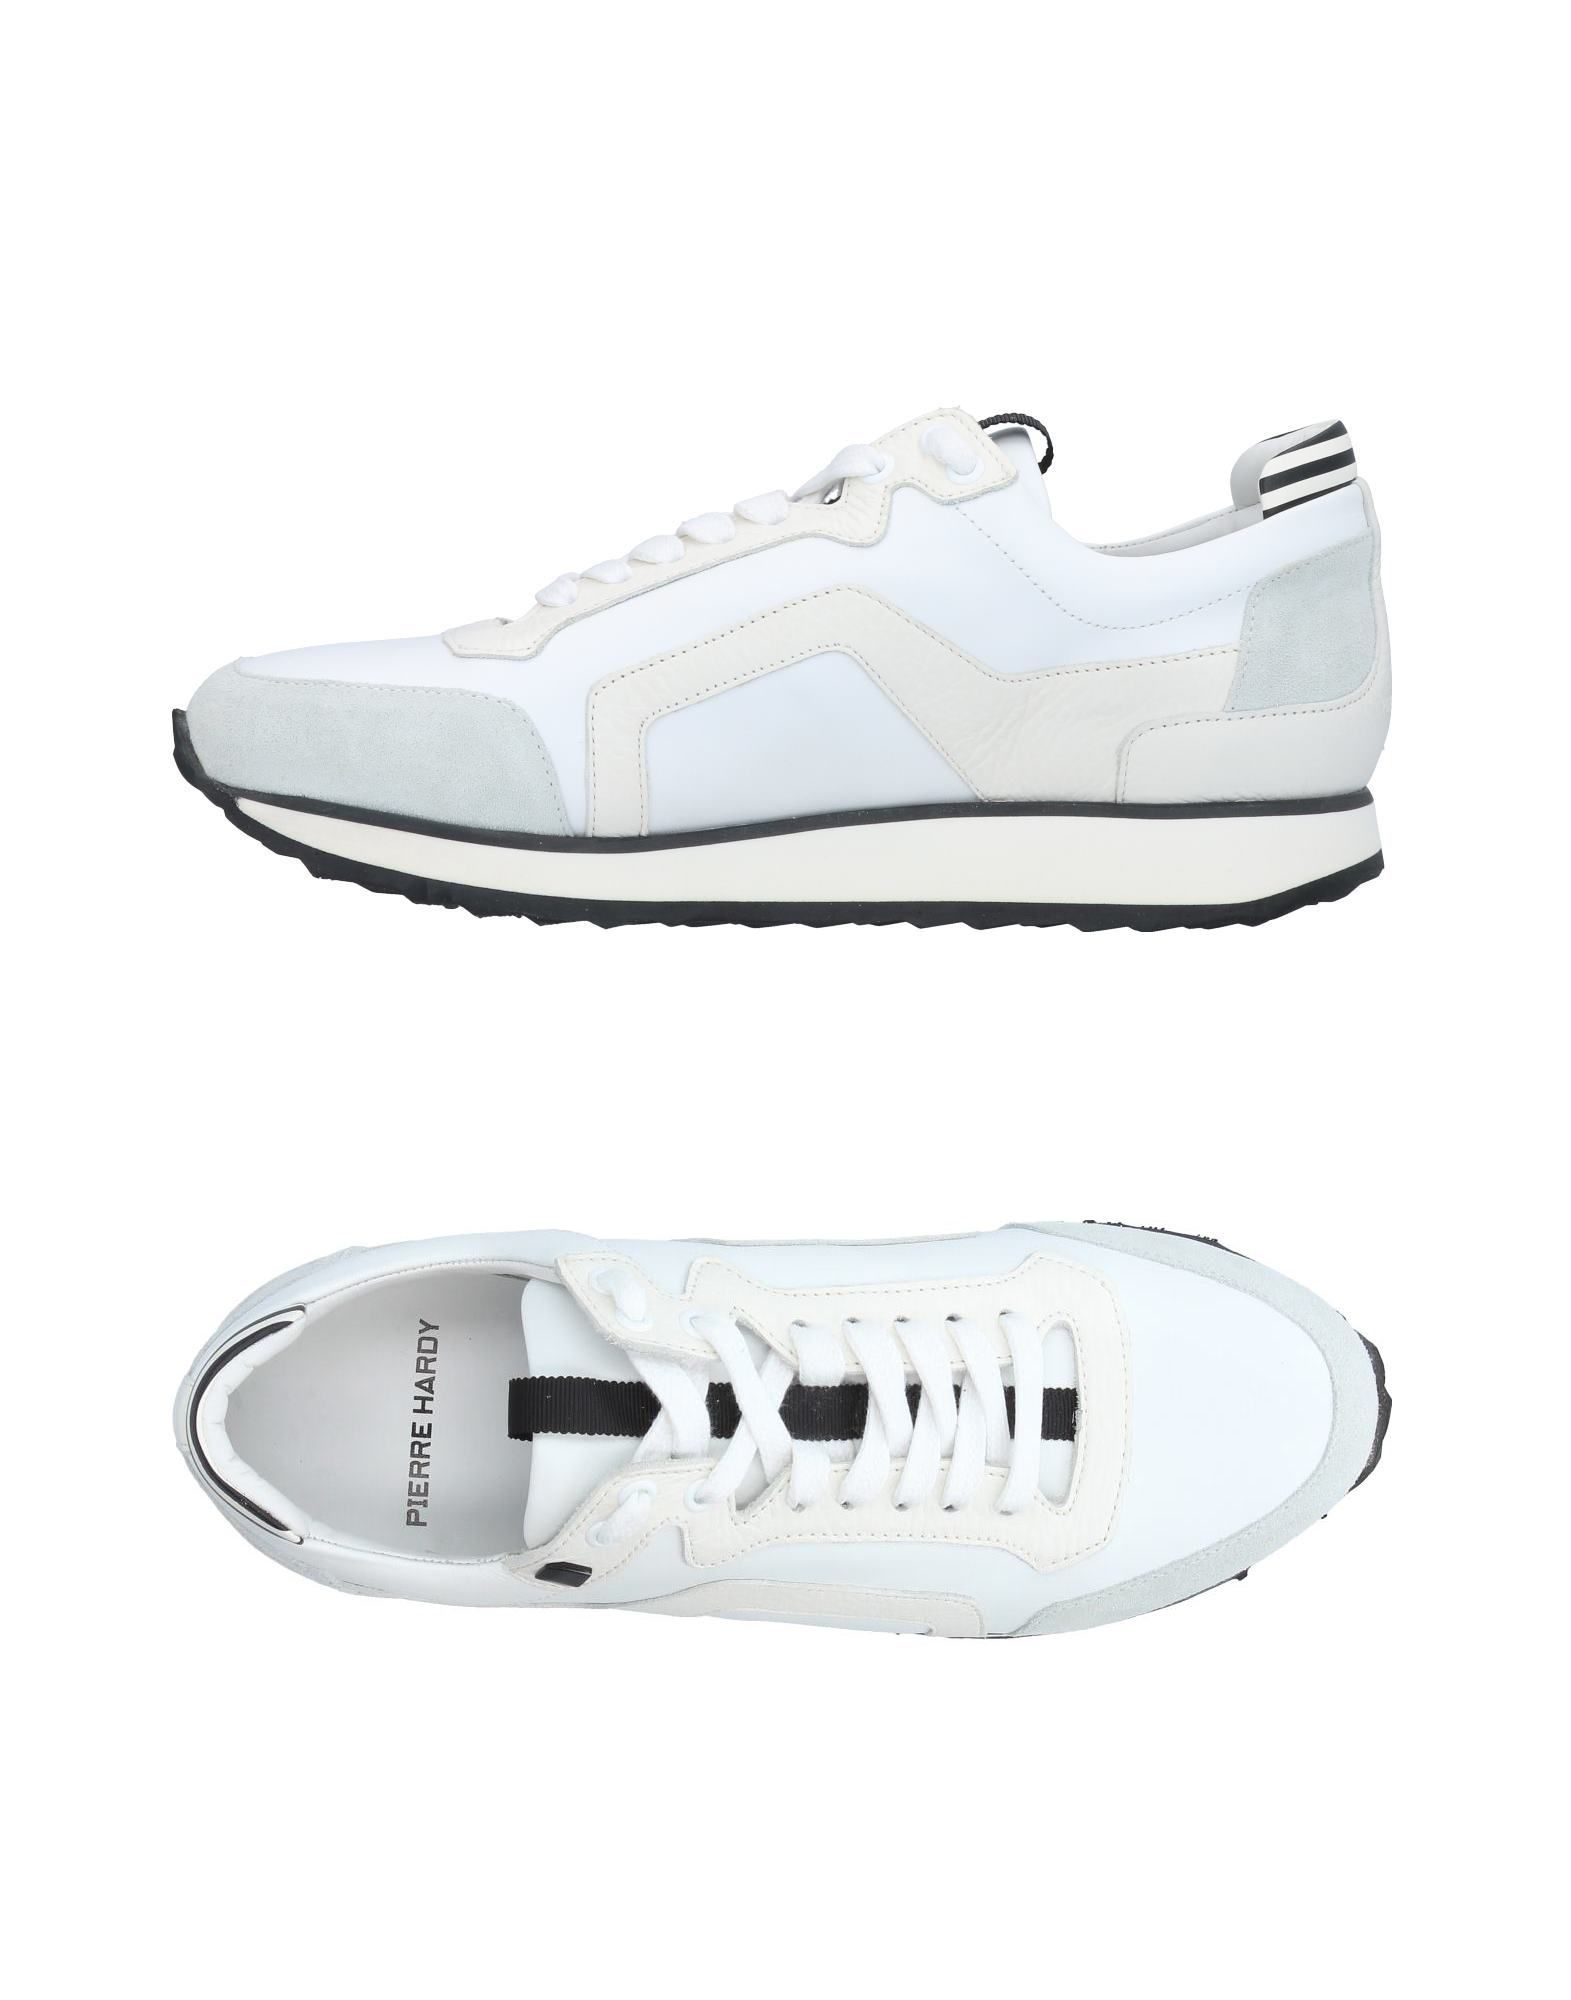 Pierre Hardy Sneakers Herren  11416973IM Gute Qualität beliebte Schuhe